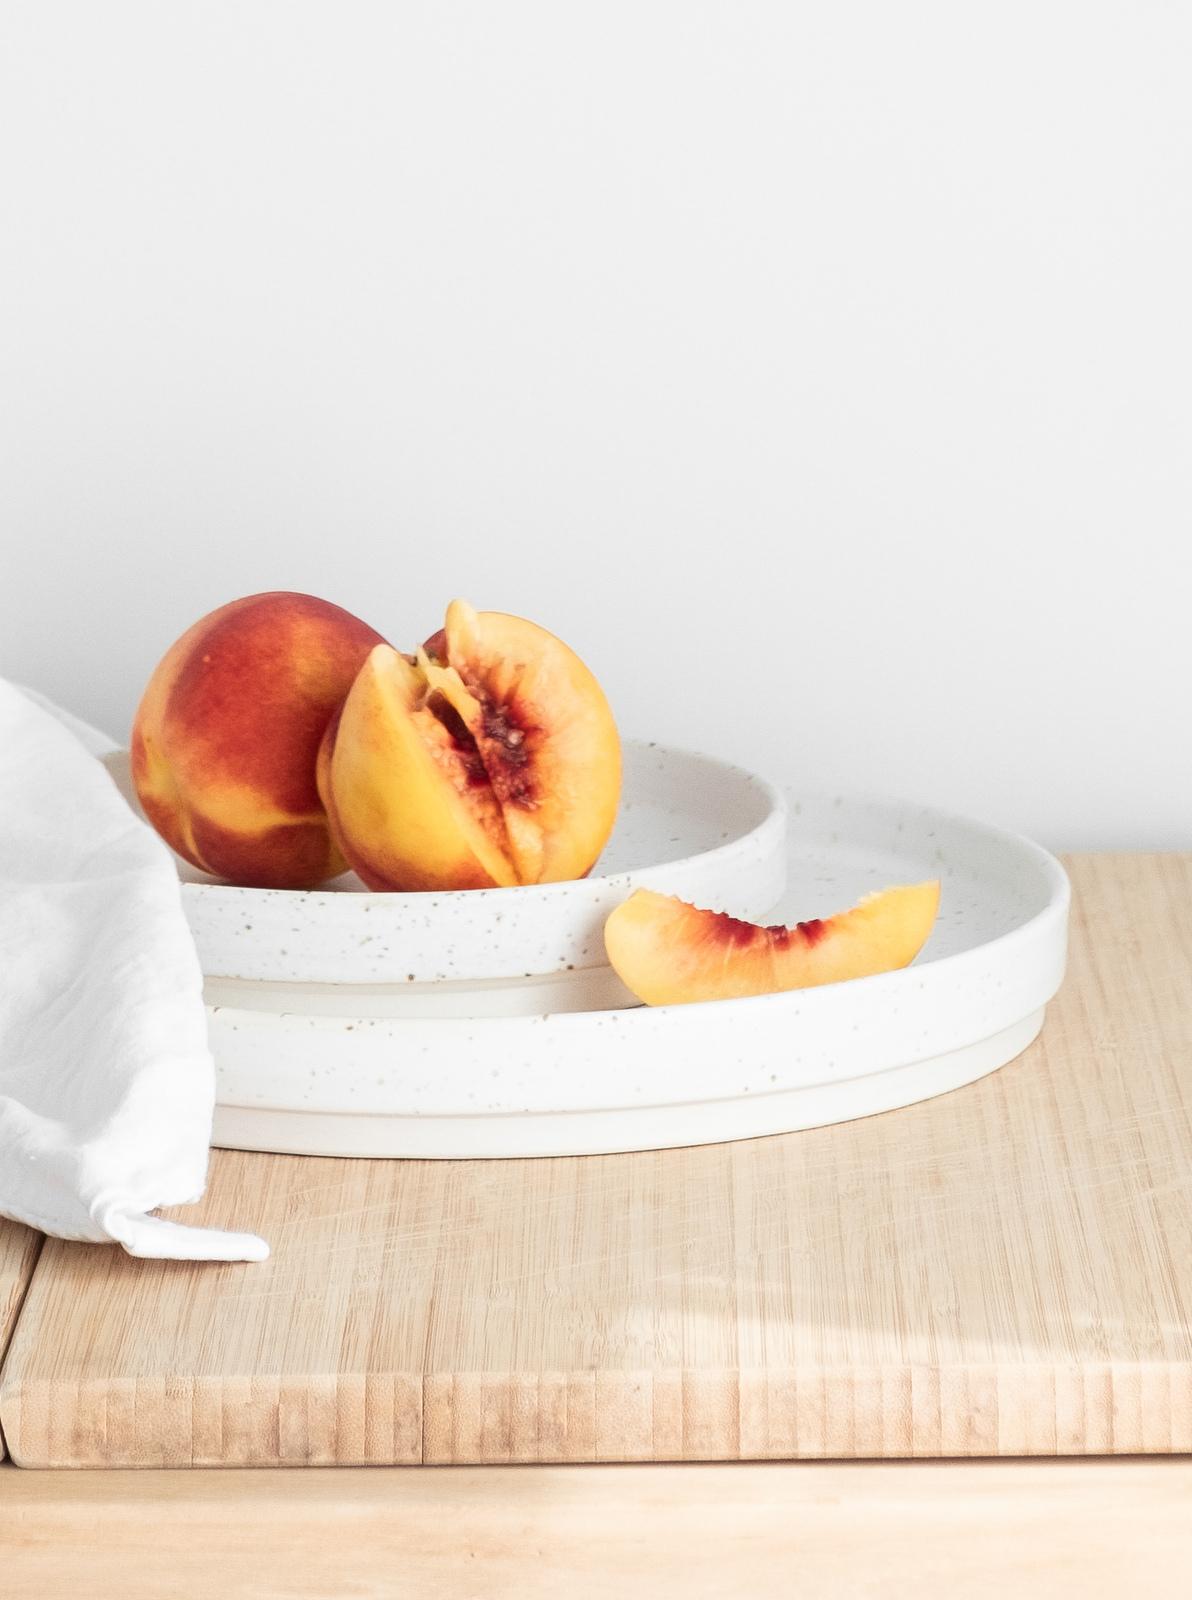 Peach served in beautiful snow ceramic plates